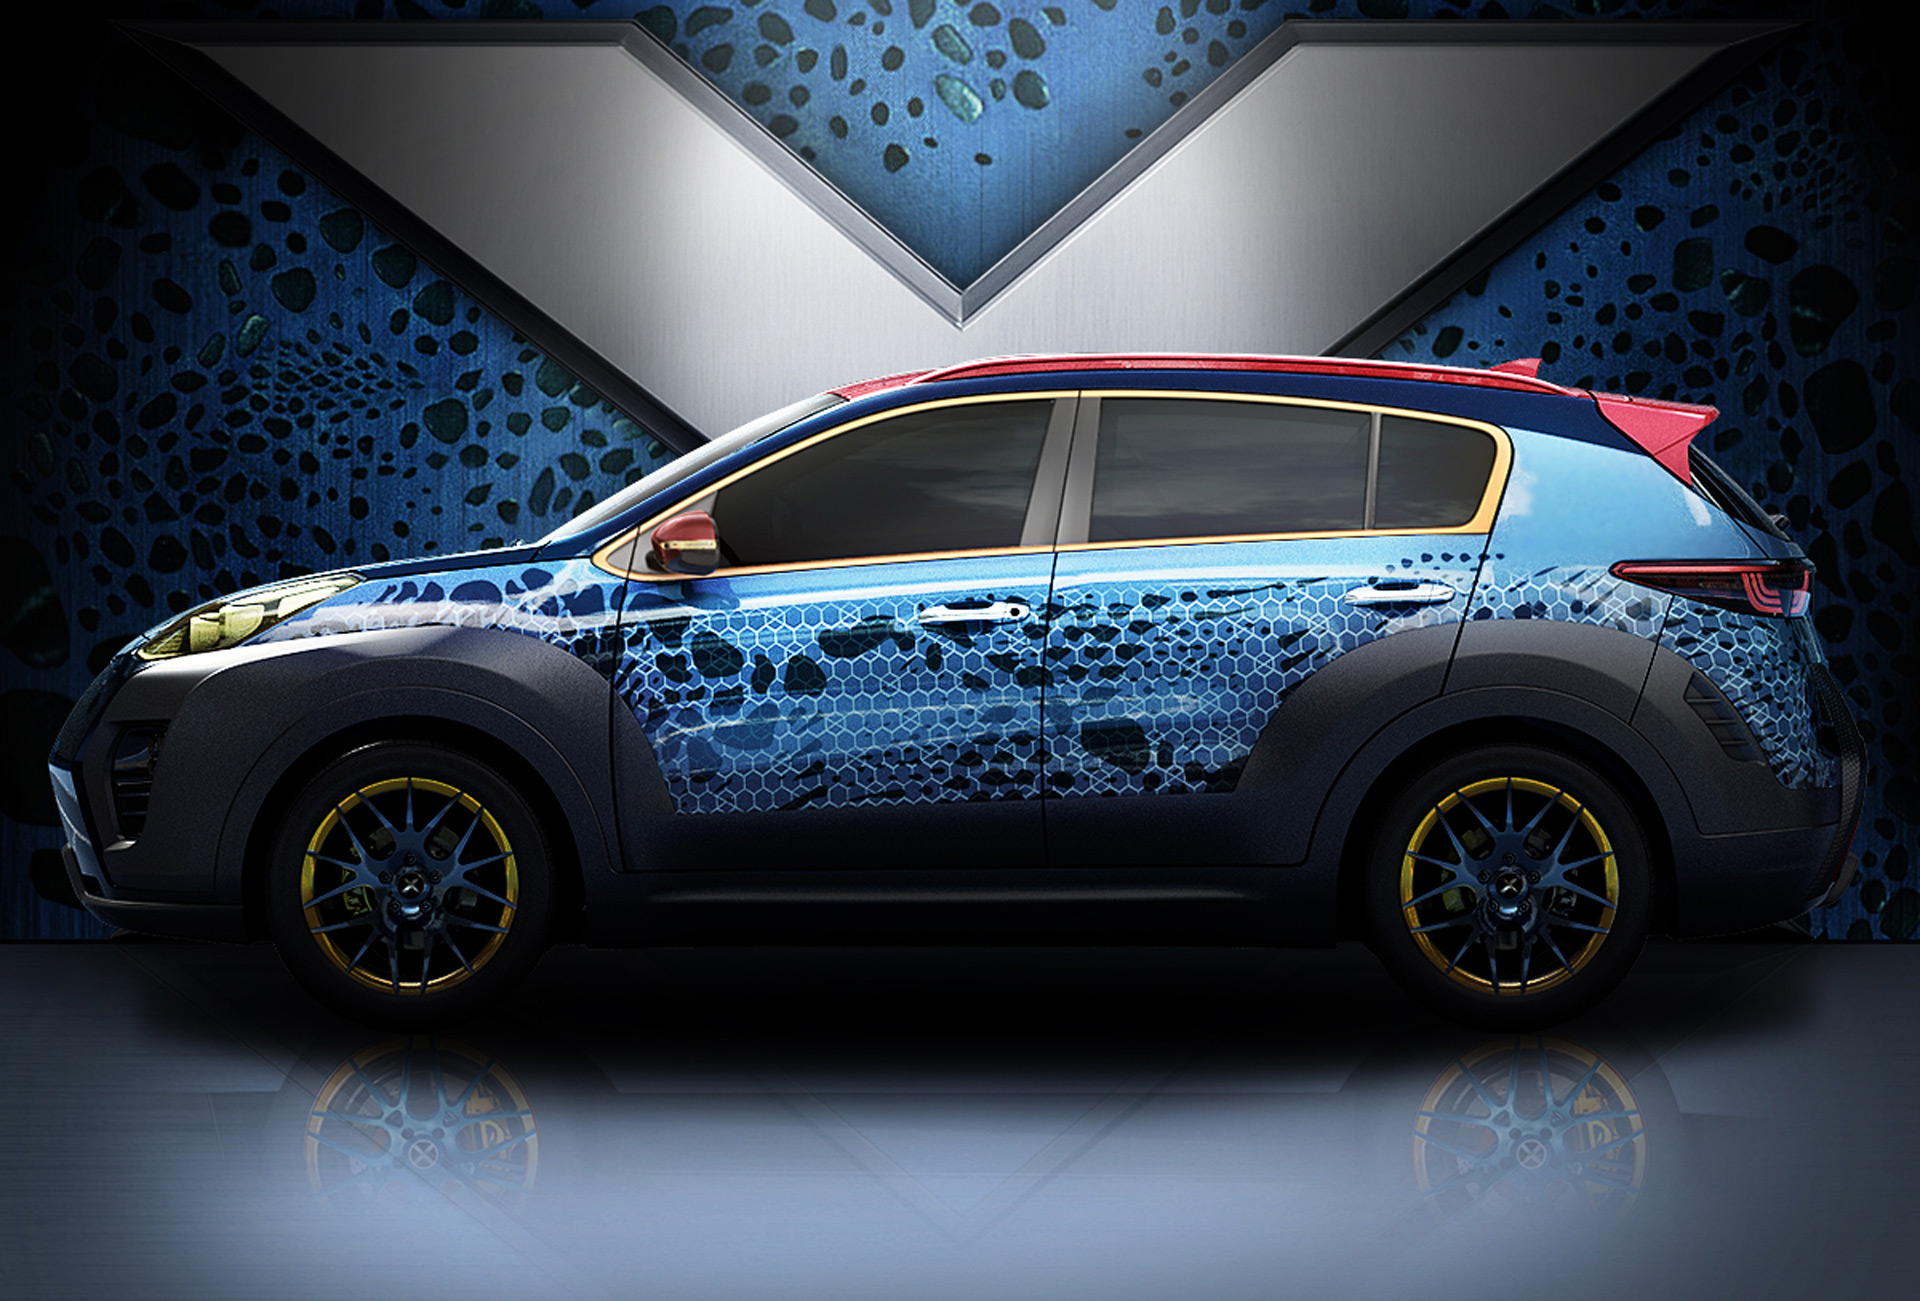 Kia Gears Up For 'X-Men: Apocalypse' With Special Sportage ...